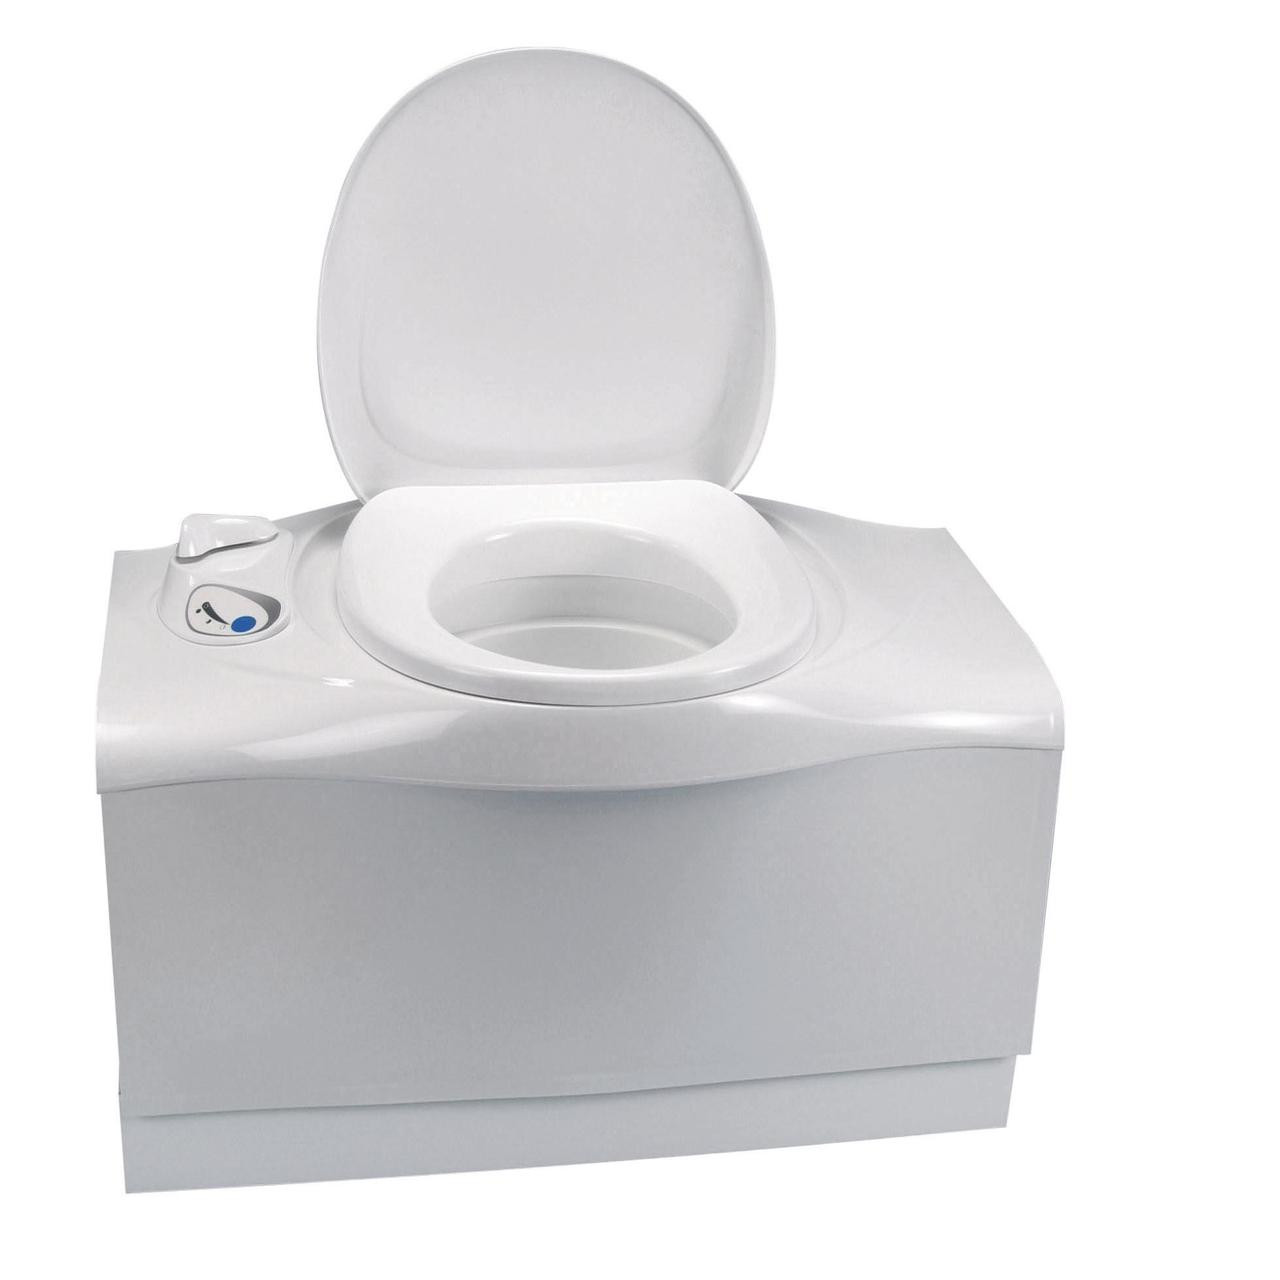 thetford c402 caravan motorhome cassette toilet. Black Bedroom Furniture Sets. Home Design Ideas